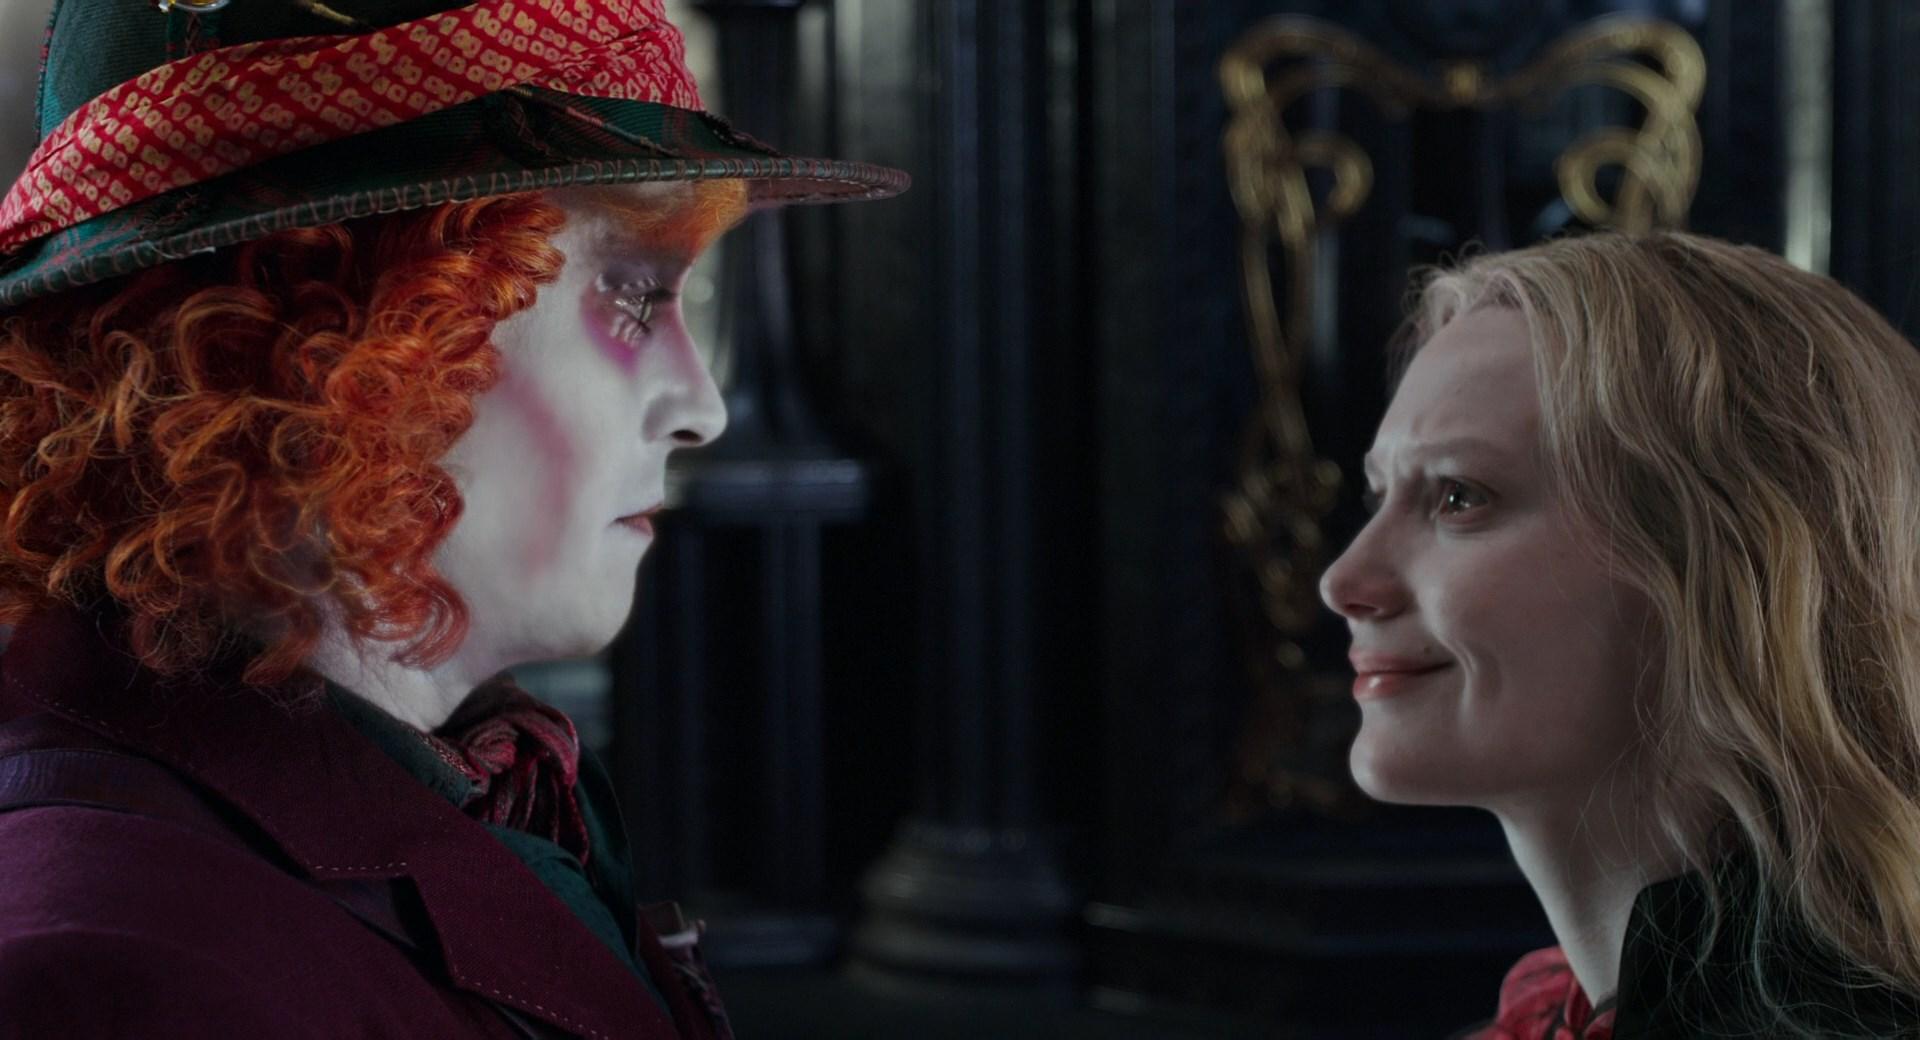 Алиса в Зазеркалье: По ту сторону зеркала (2016)